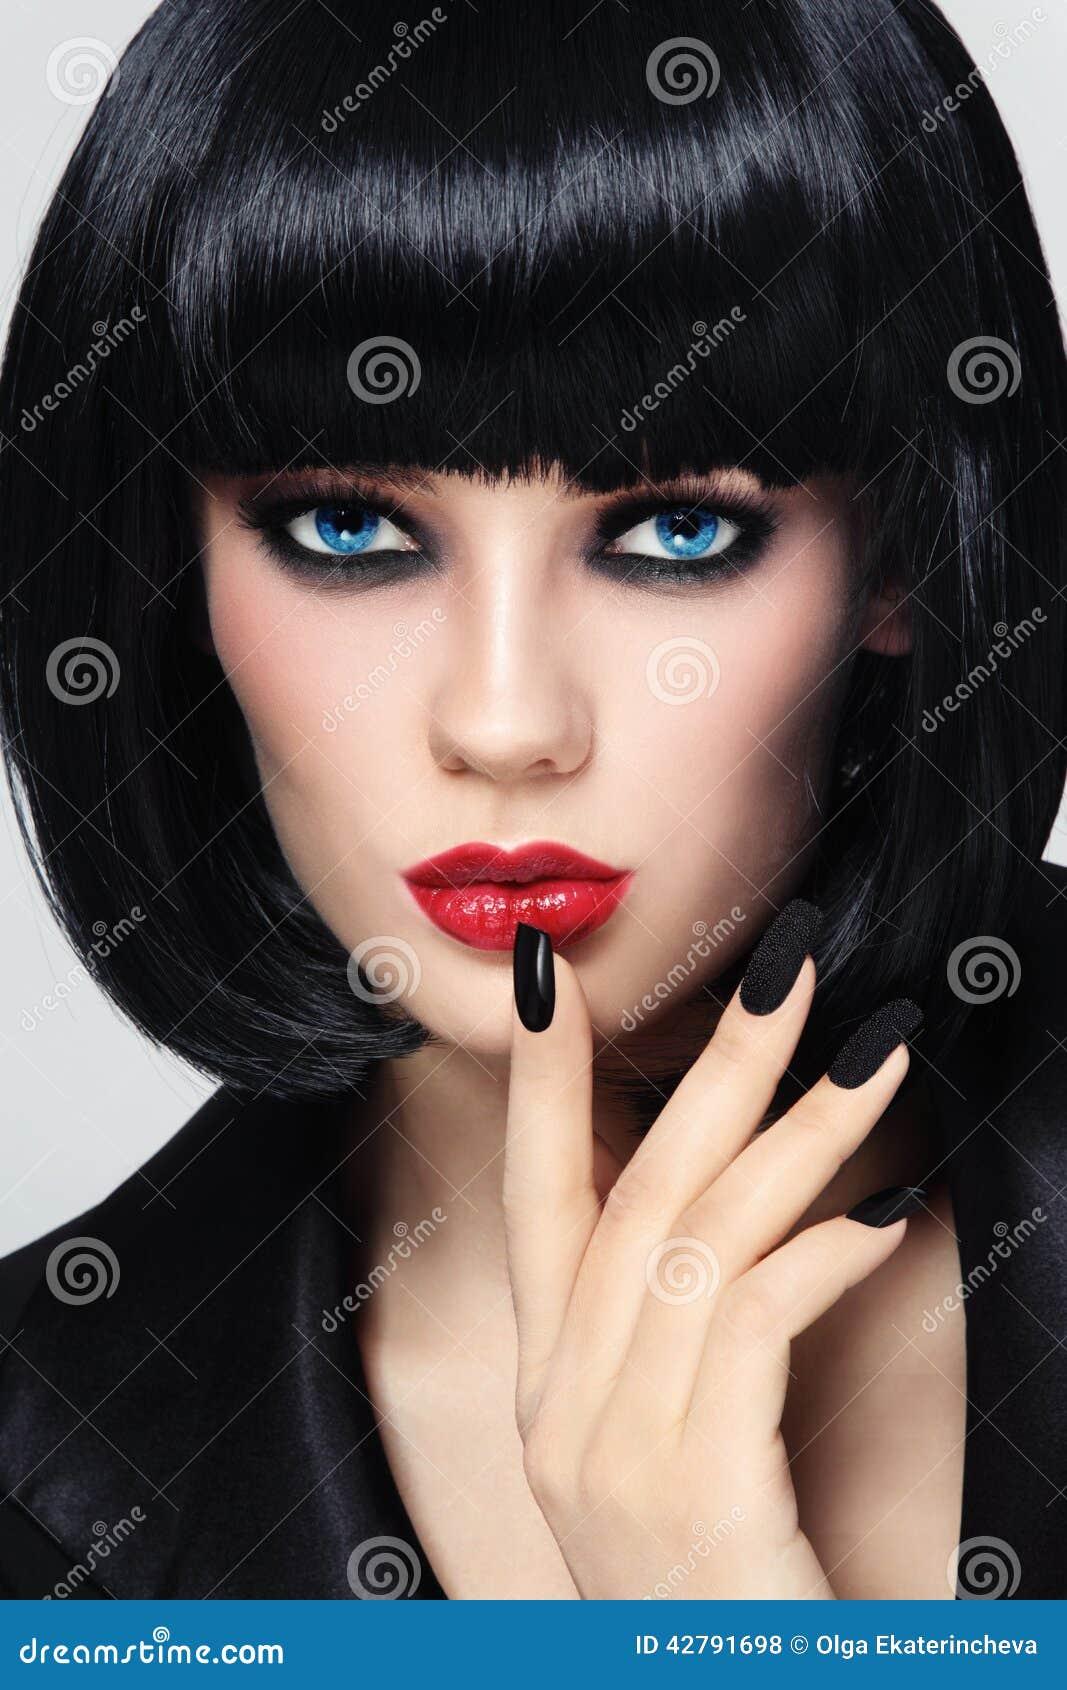 Black Bob And Manicure Stock Photo Image Of Cosmetics 42791698